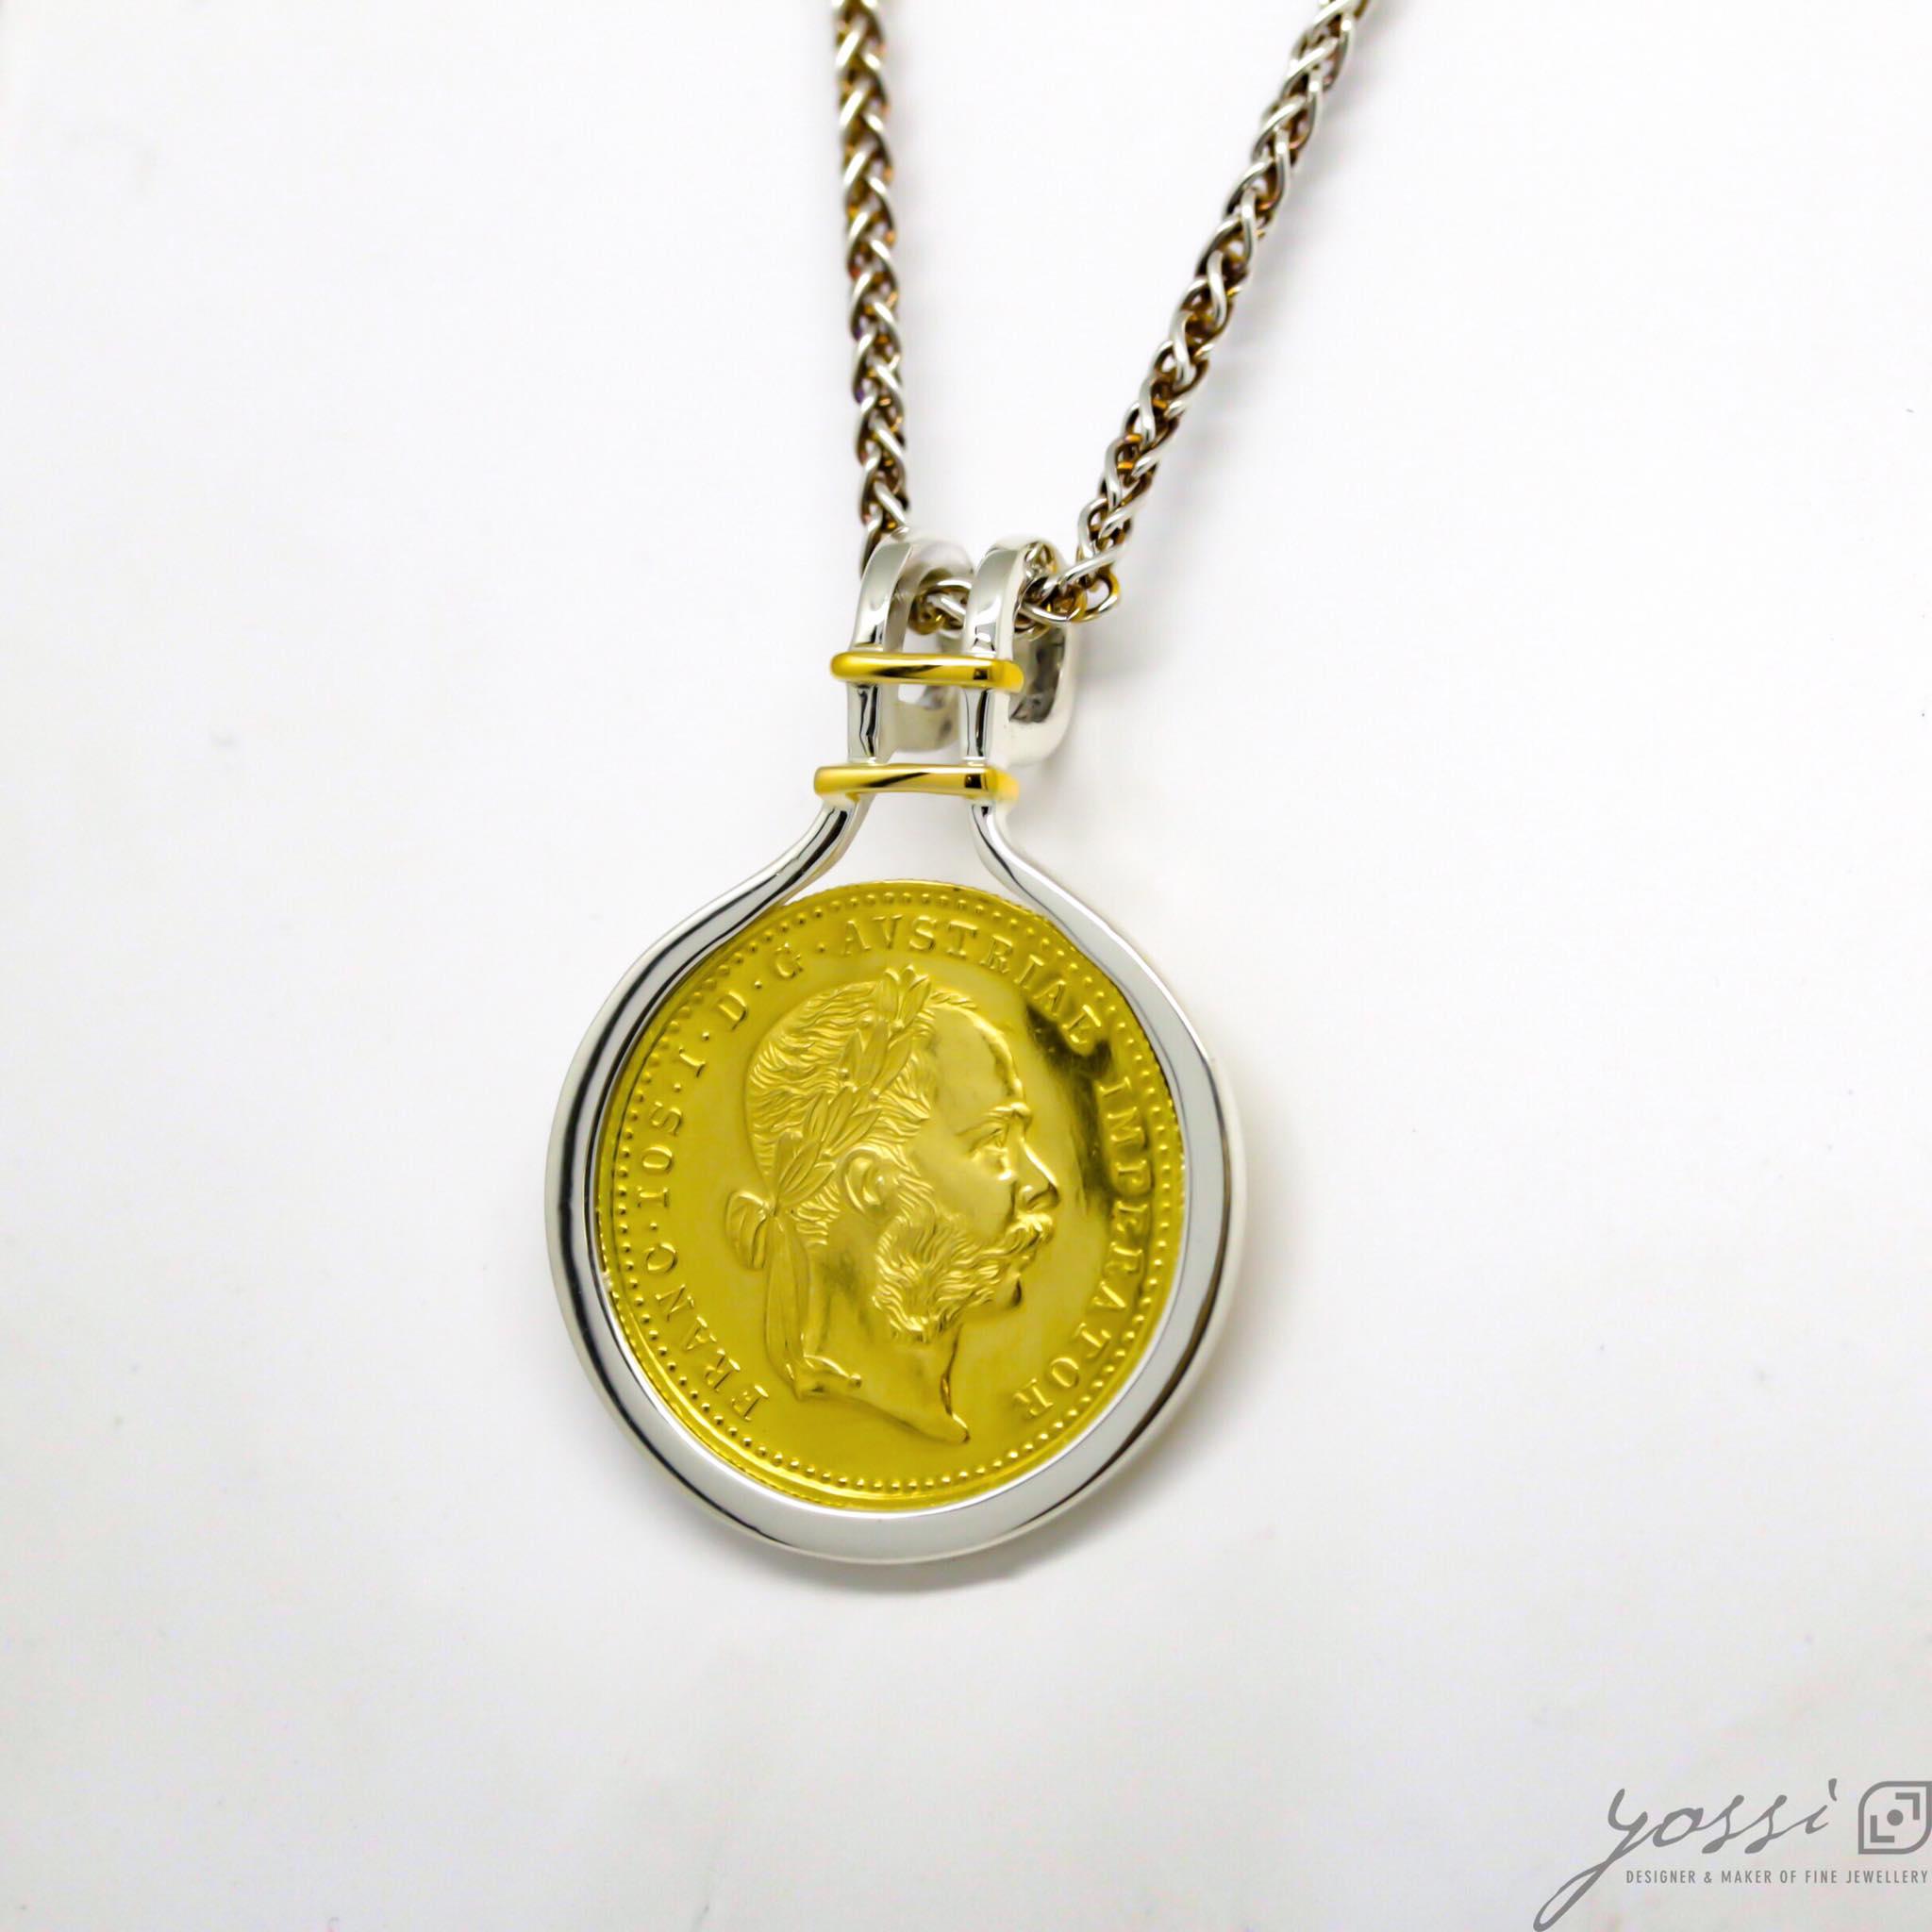 Bespoke Coin Pendant